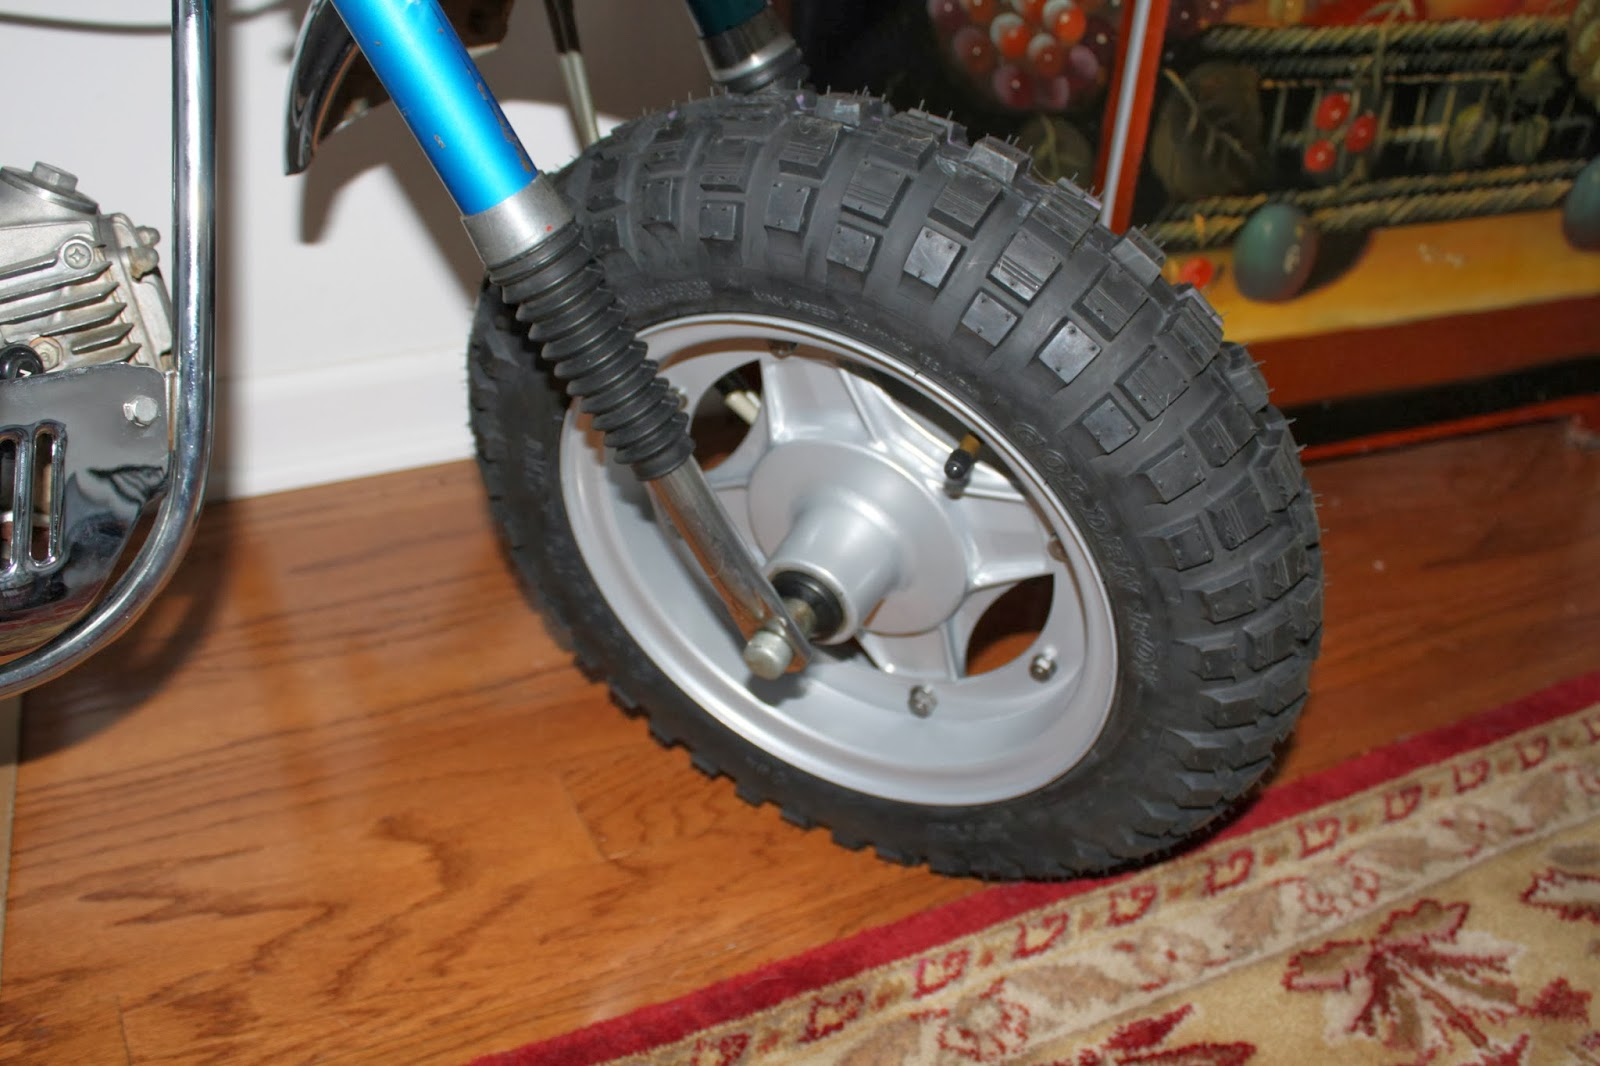 1970 Honda Ct70 Trail Bike 2000 Ann Arbor Grooshs Garage Carburetor